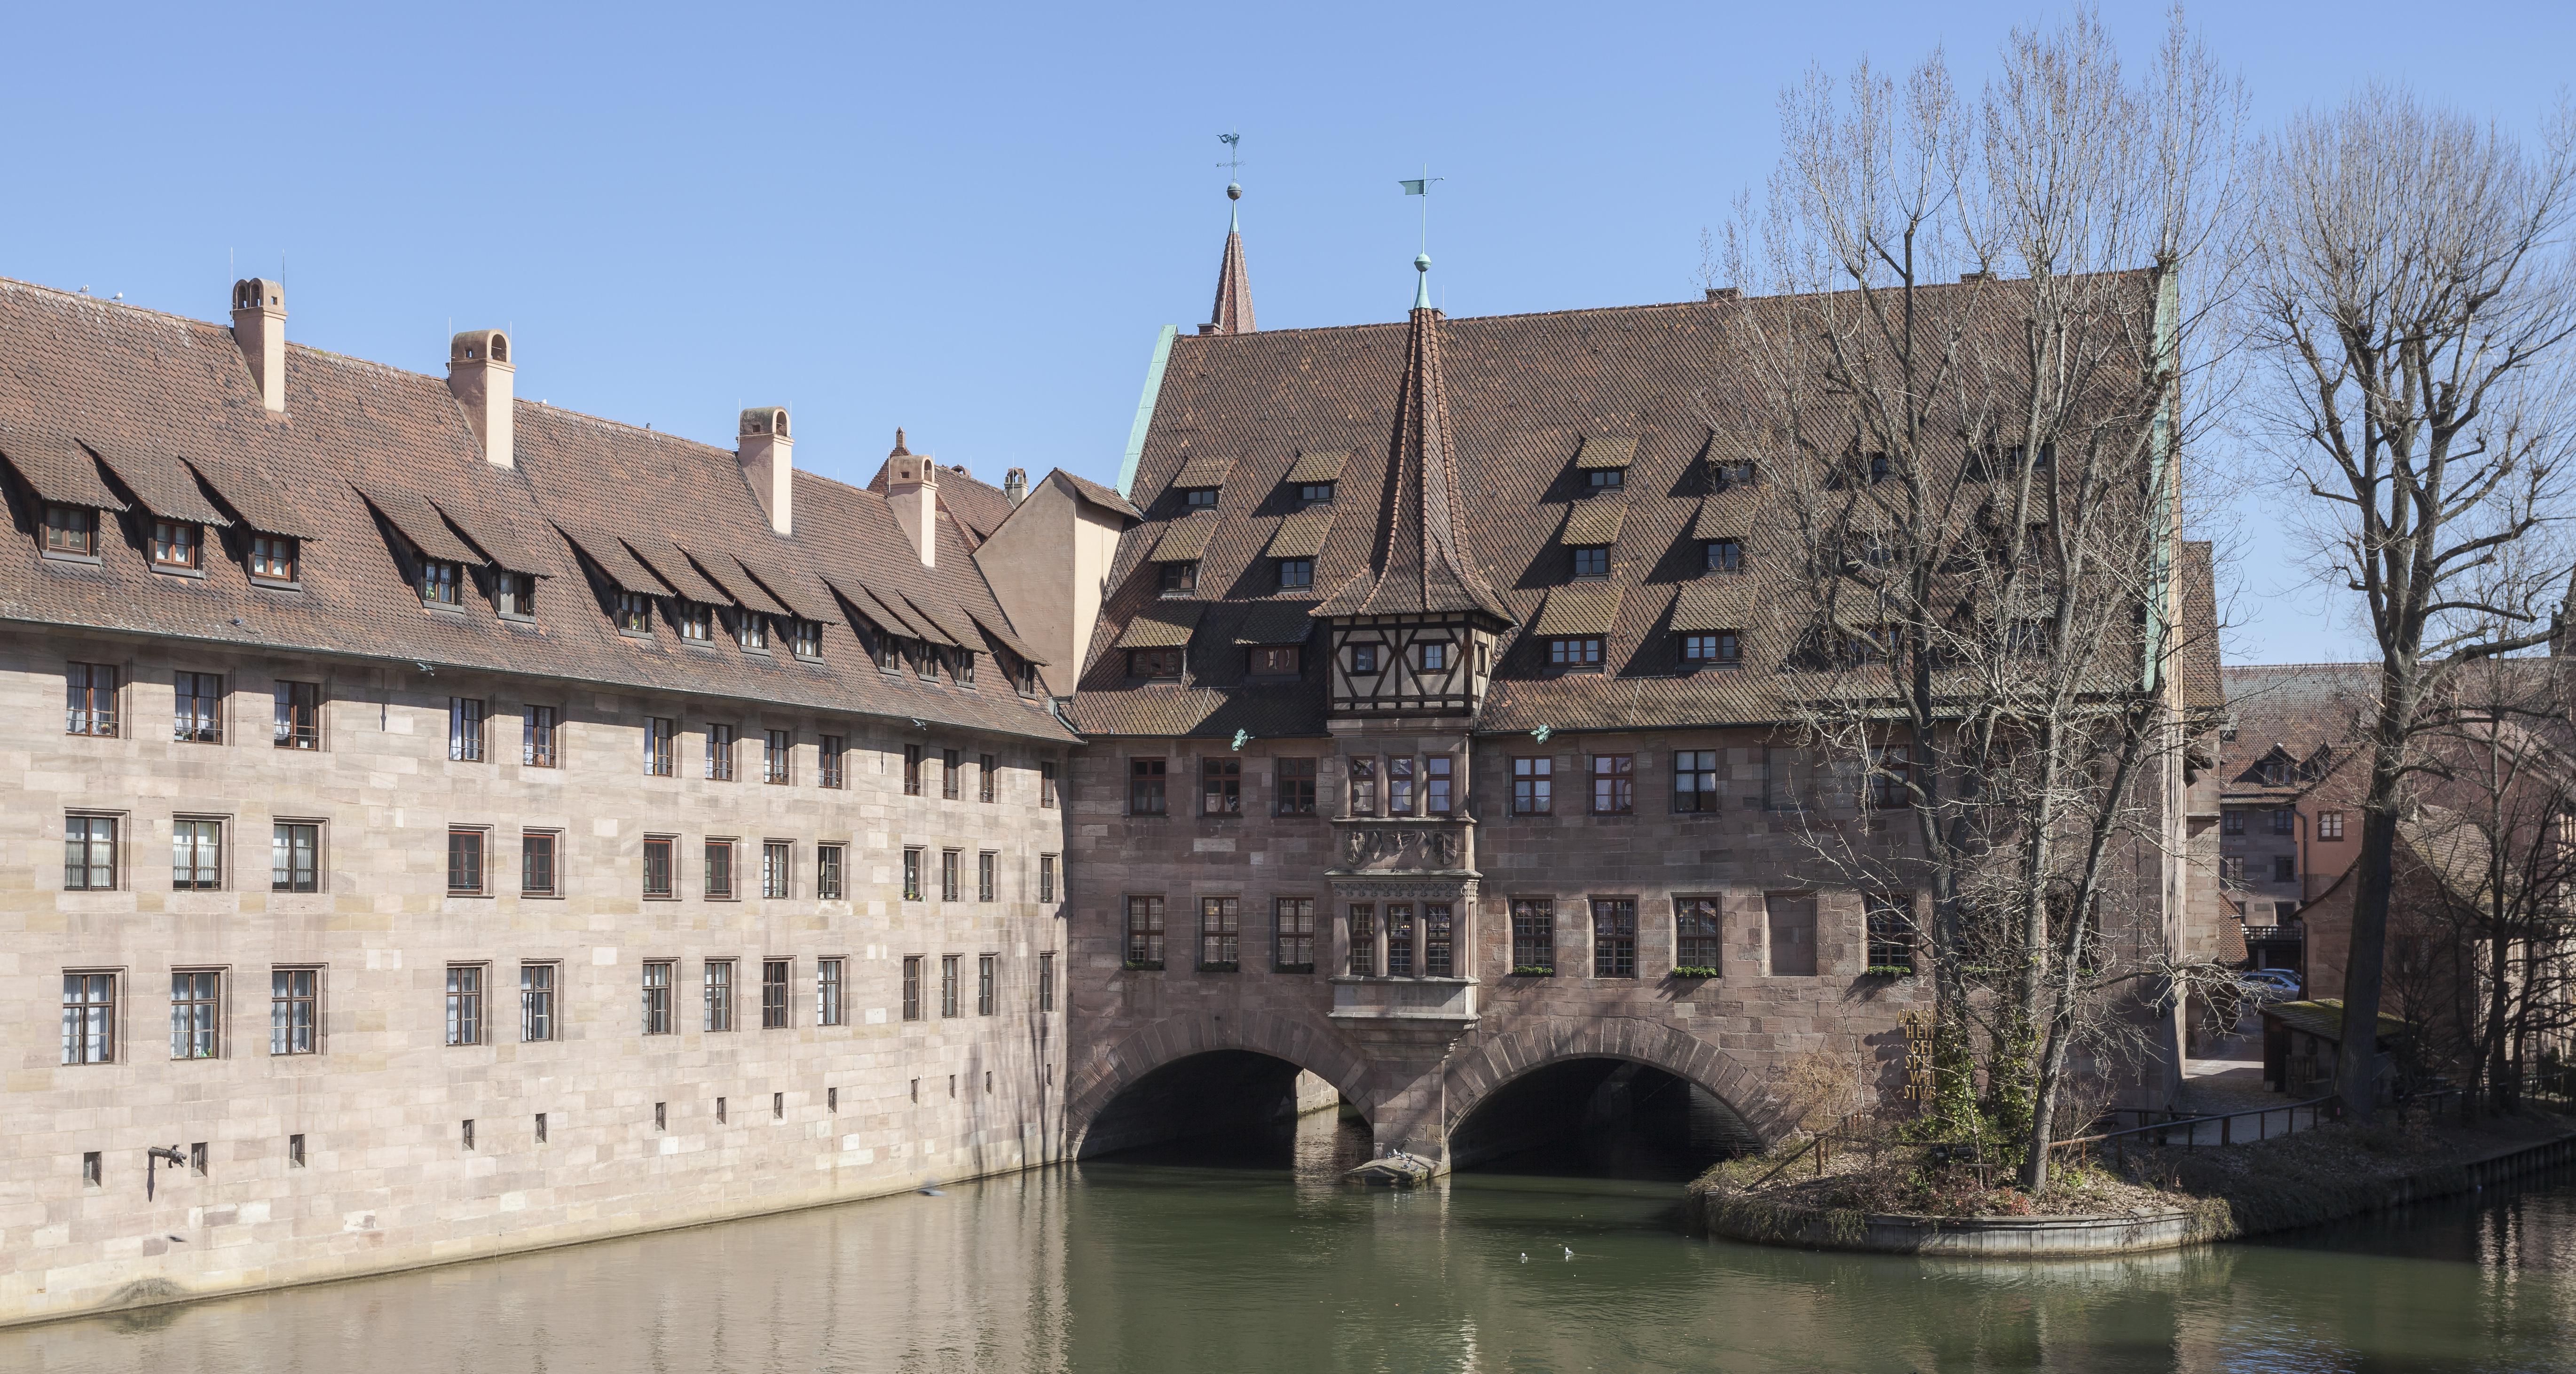 Nuremberg dating